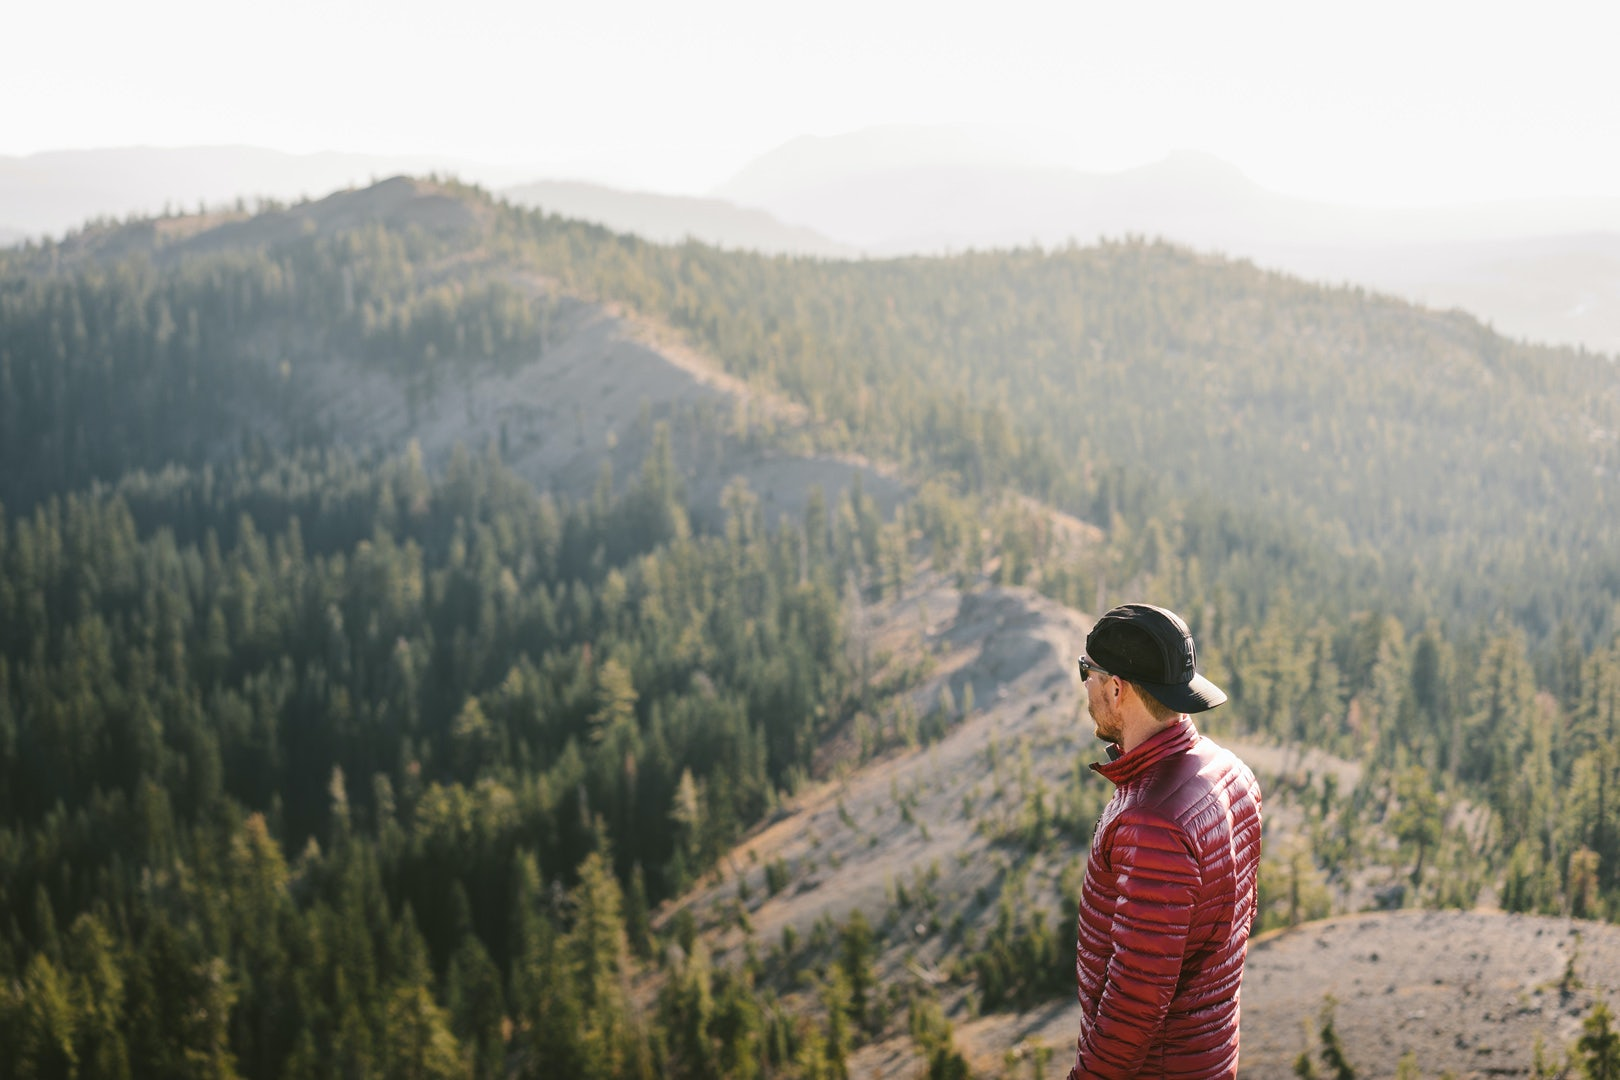 Tillak - Finding Balance with Jeff Maclellan